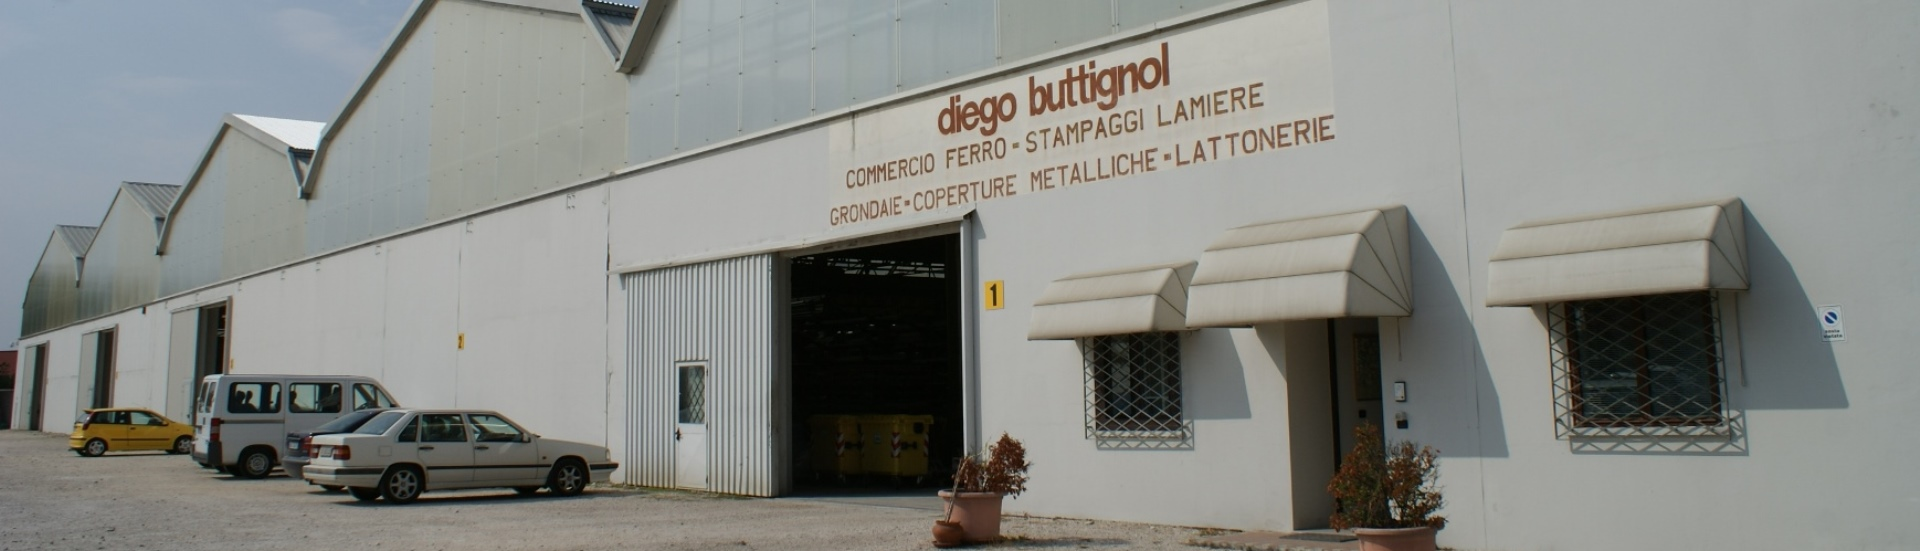 buttignol-banner-150x150.jpg